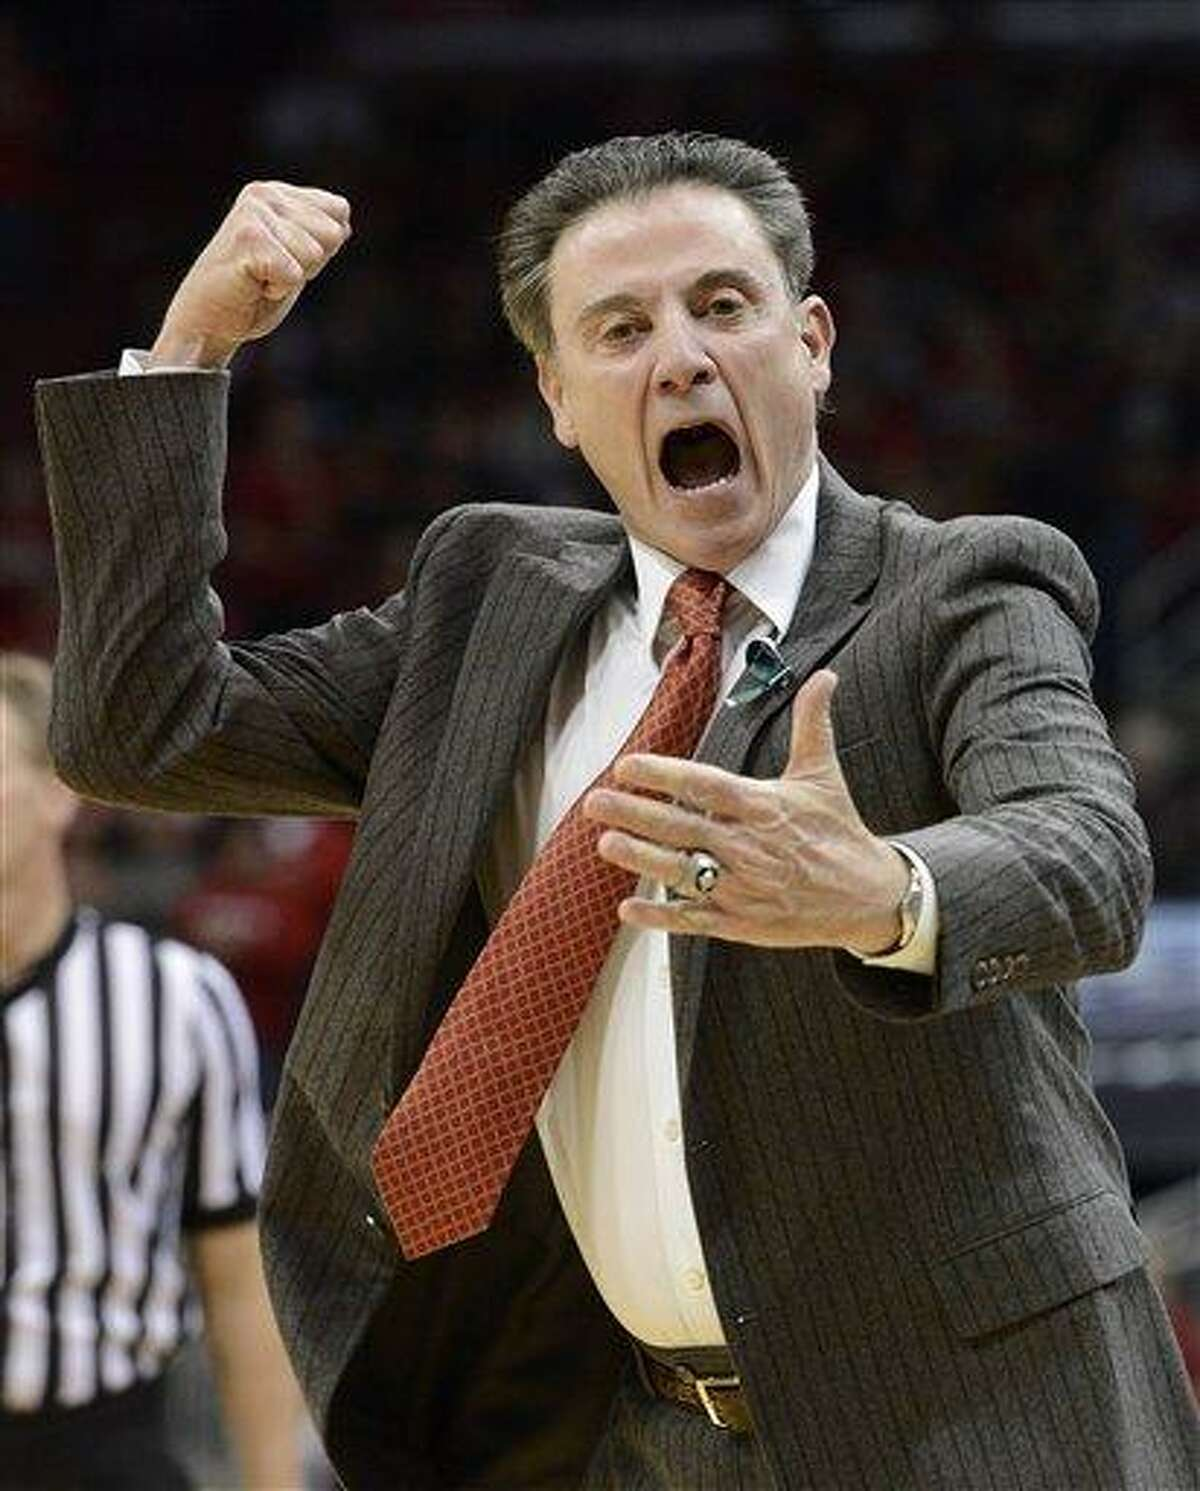 Louisville head coach Rick Pitino. (AP file photo/Timothy D. Easley)